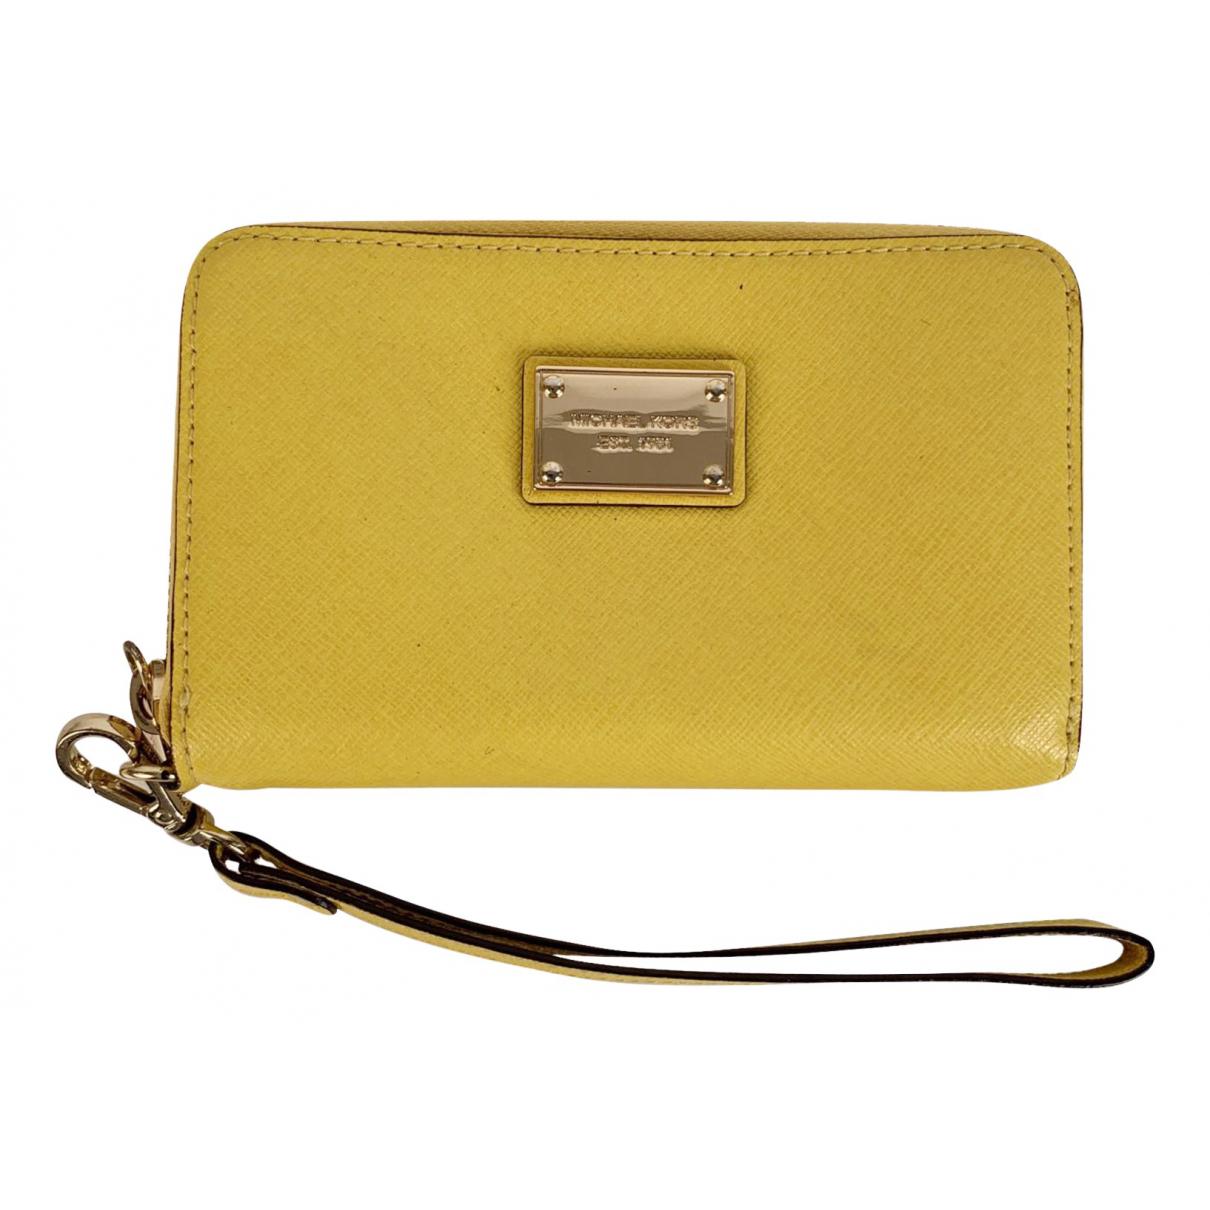 Michael Kors N Yellow Leather wallet for Women N